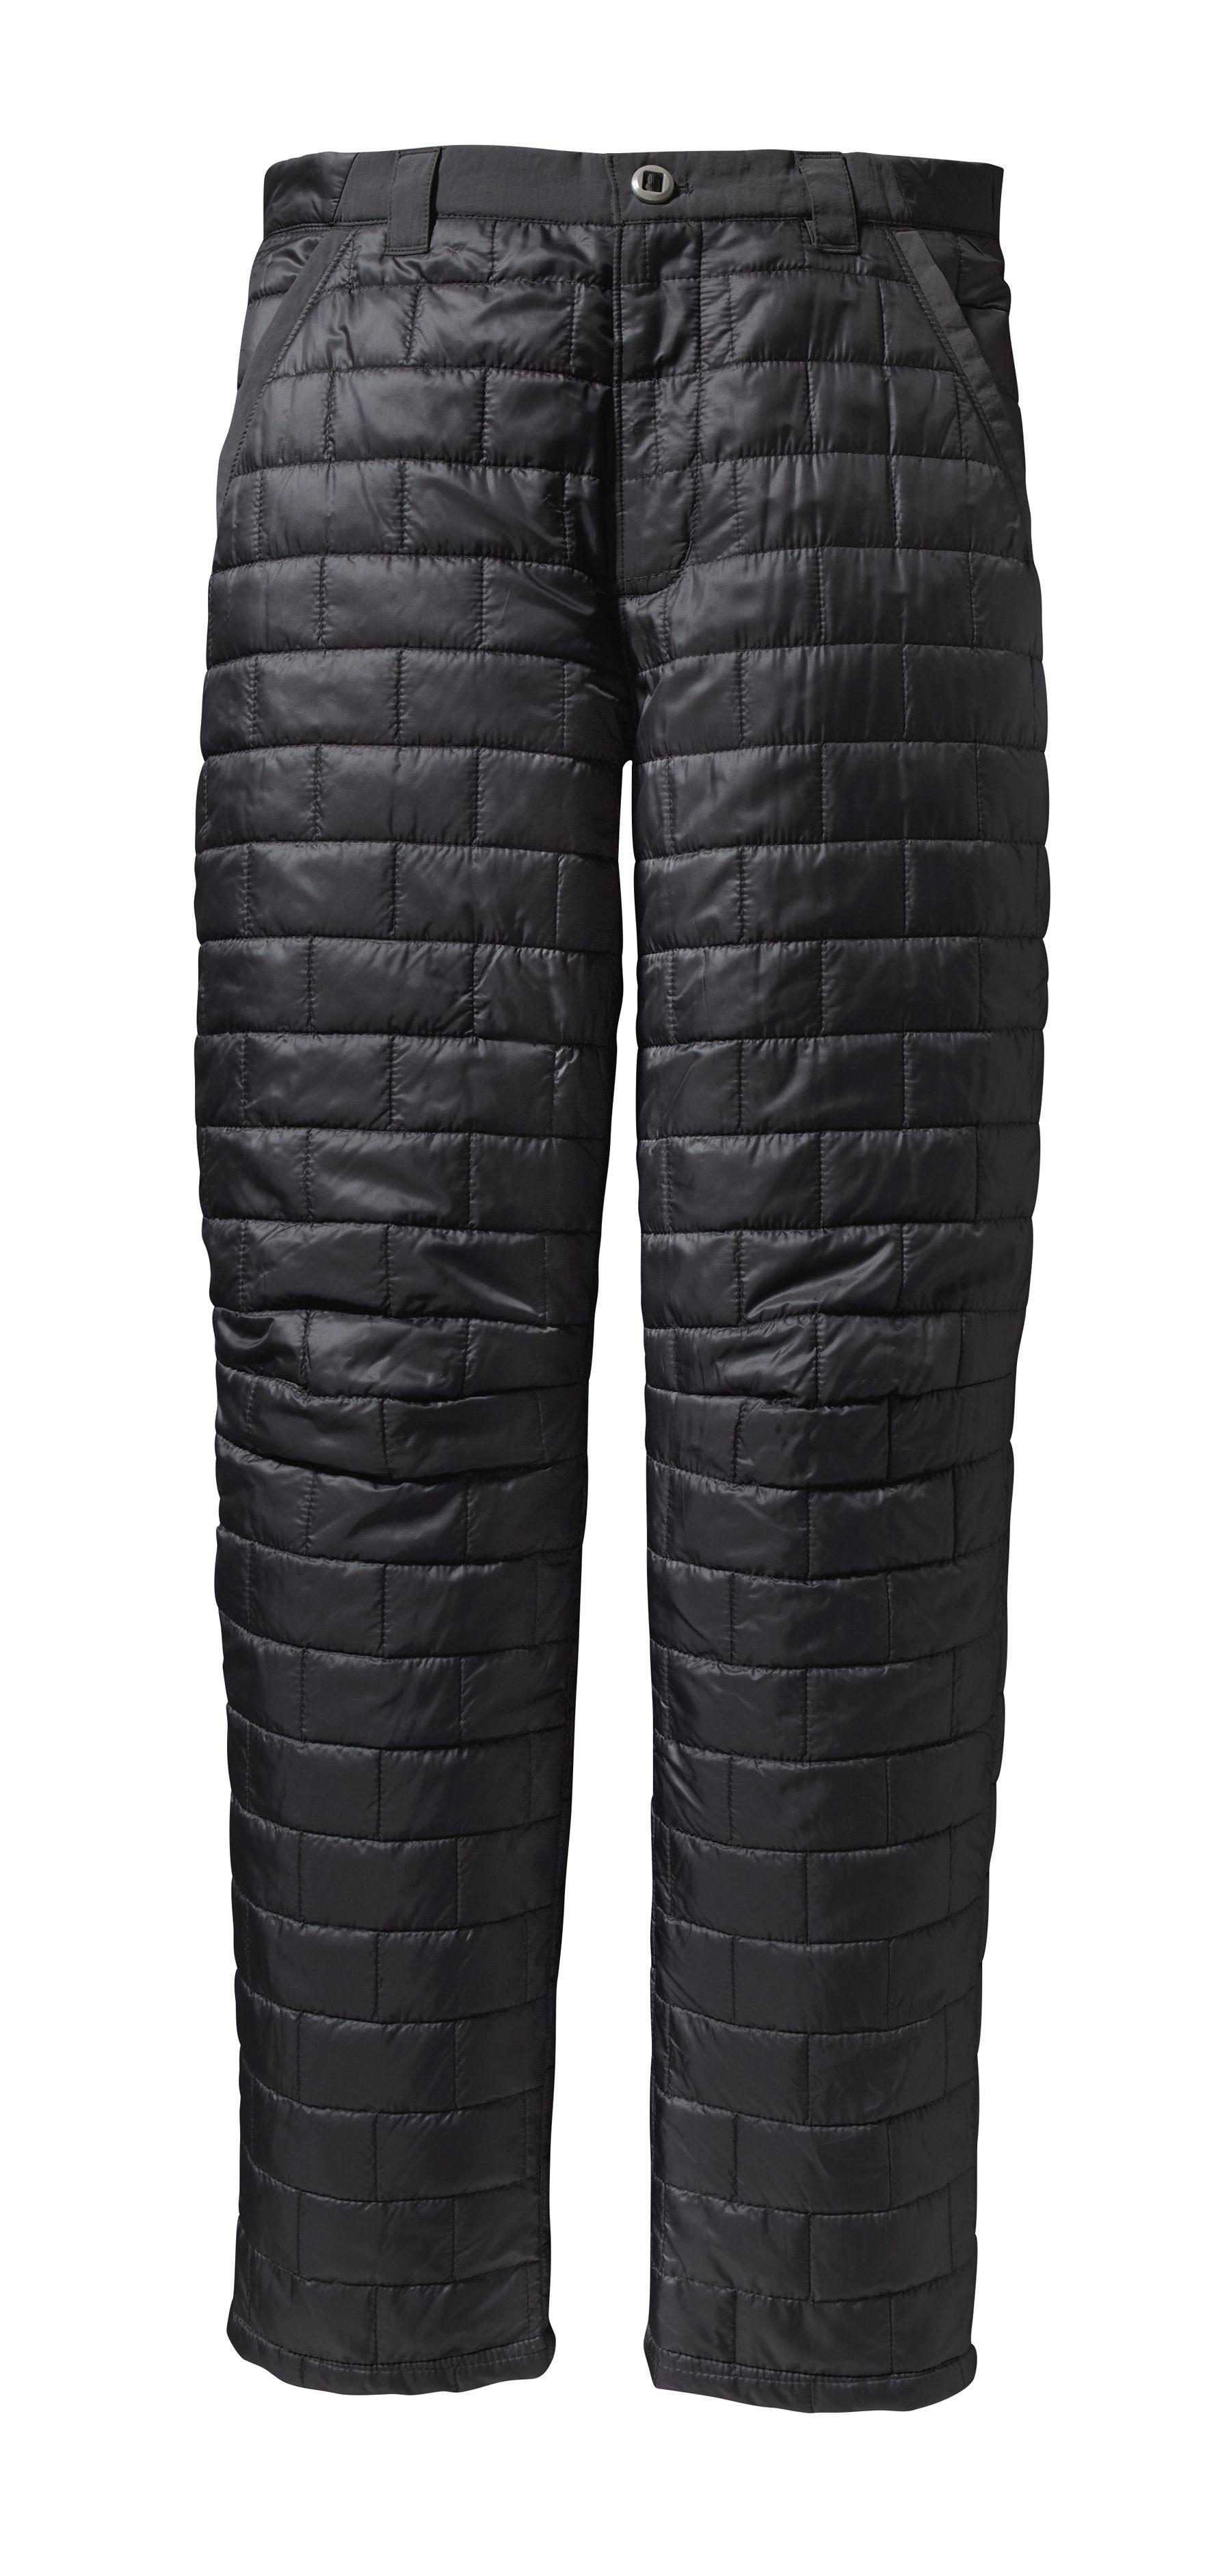 81170f3be32 Kalhoty Patagonia Nano Puff Pants